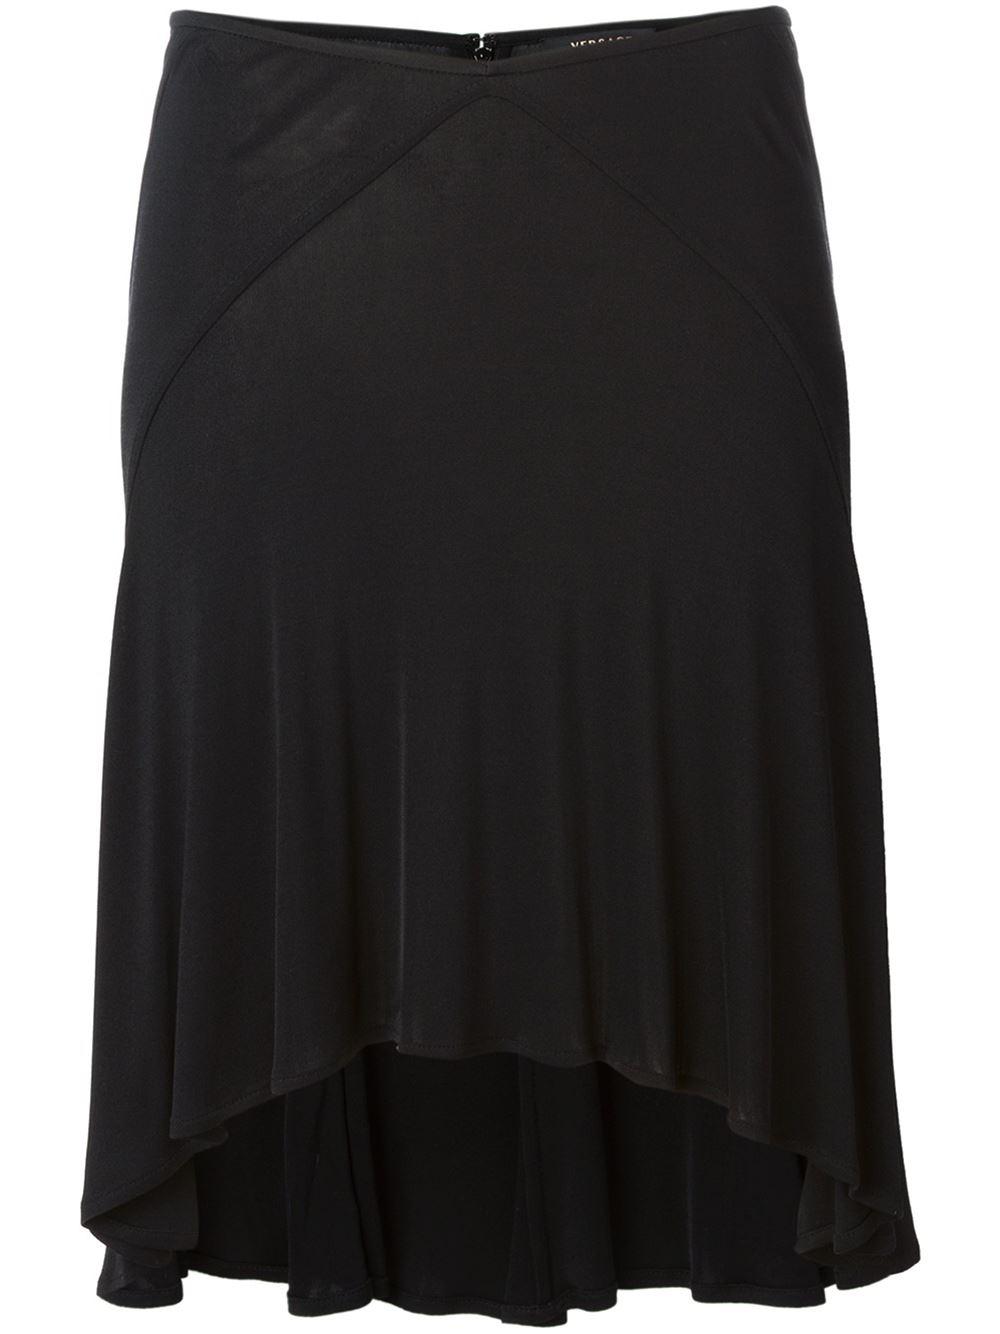 Versace Fluid Flared Skirt in Black